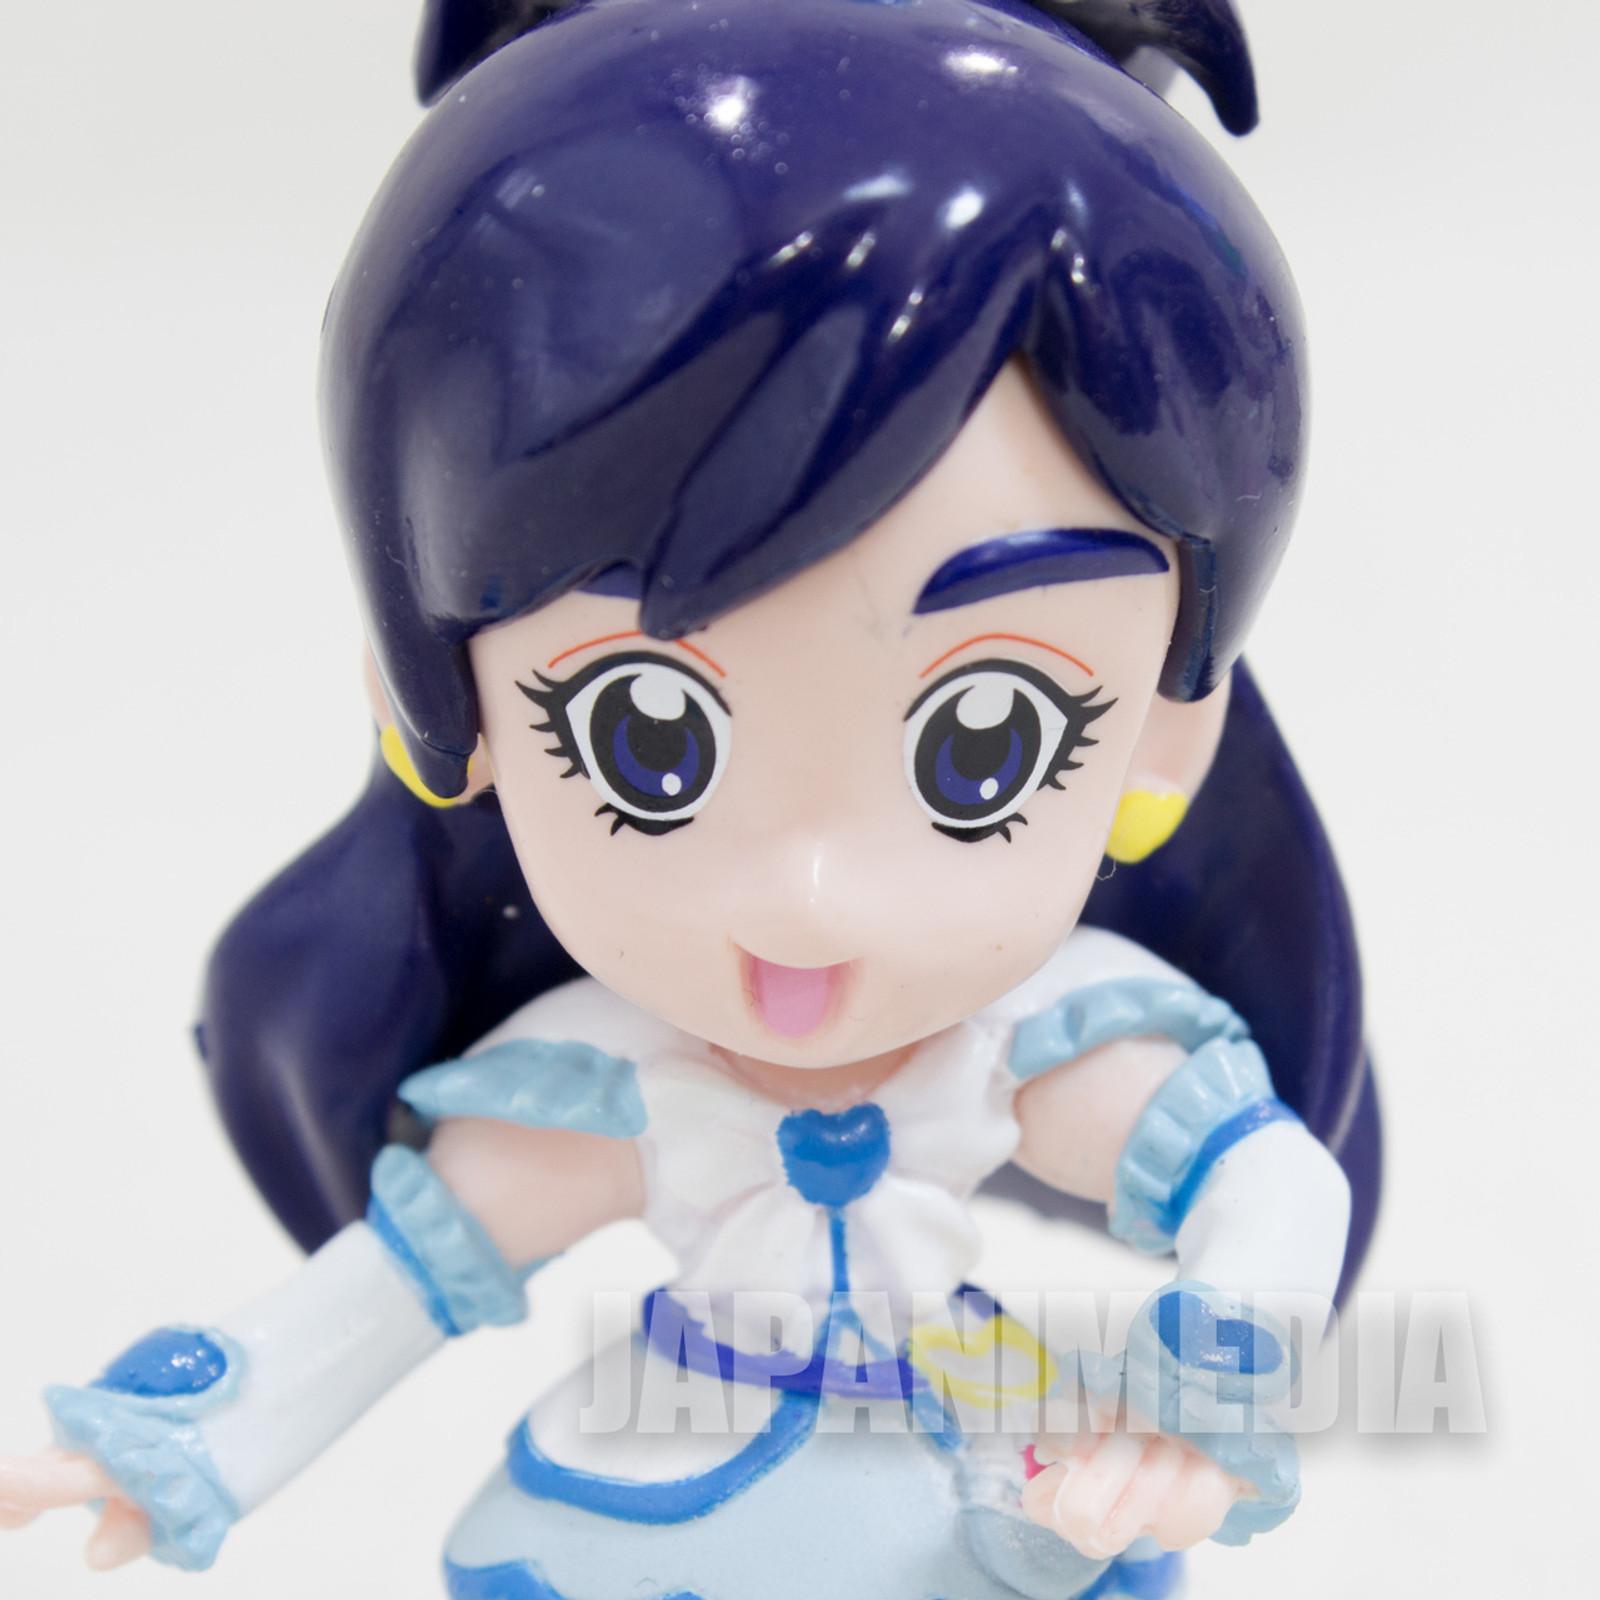 Futari wa Pretty Cure Max Heart Cure White (Honoka Yukishiro) Petit cute Figure JAPAN ANIME